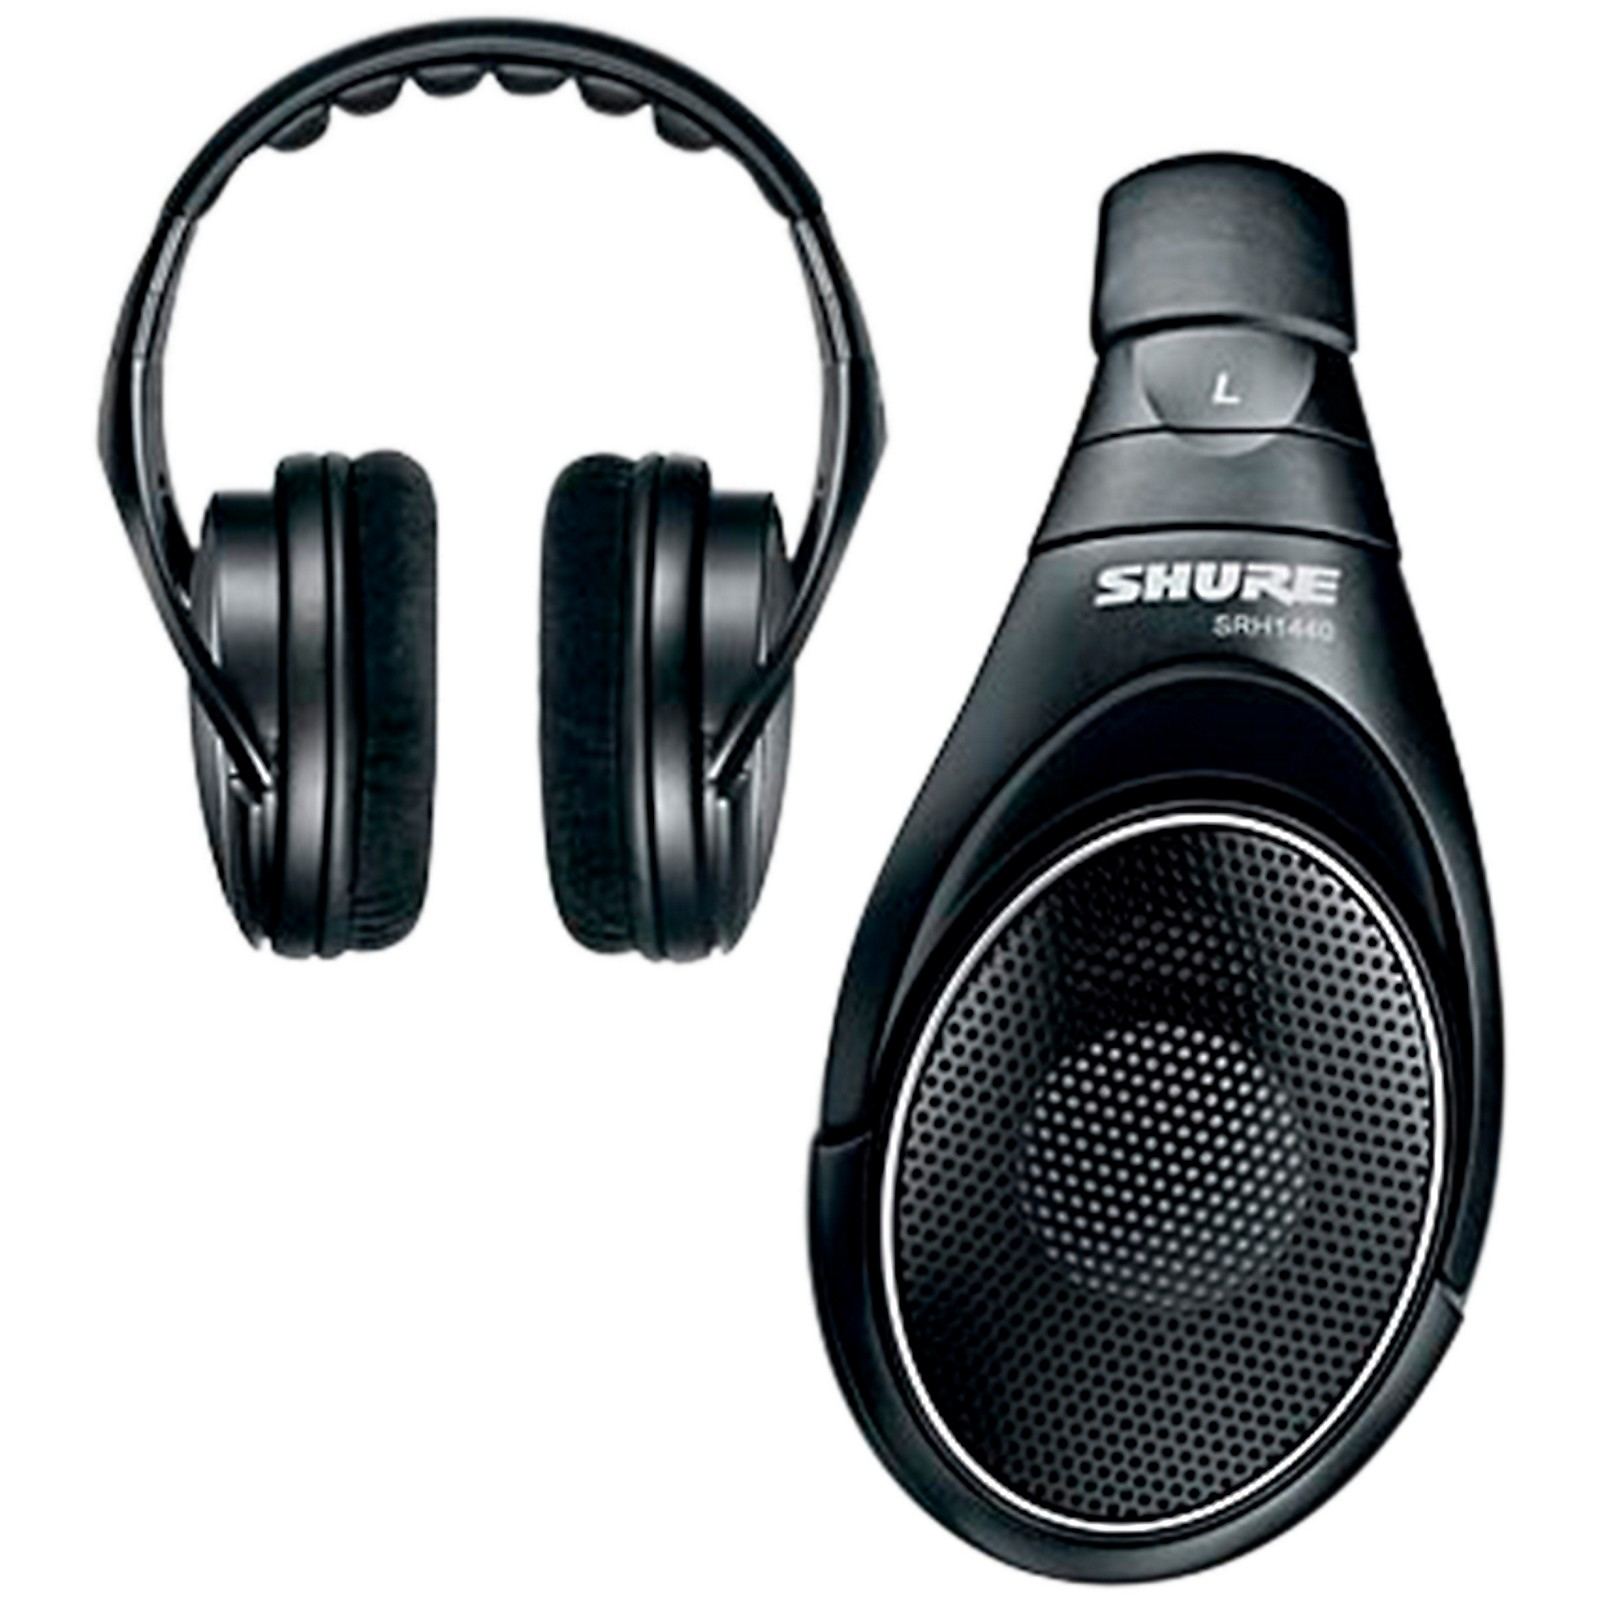 Open Box Shure SRH1440 Professional Open Back Headphones